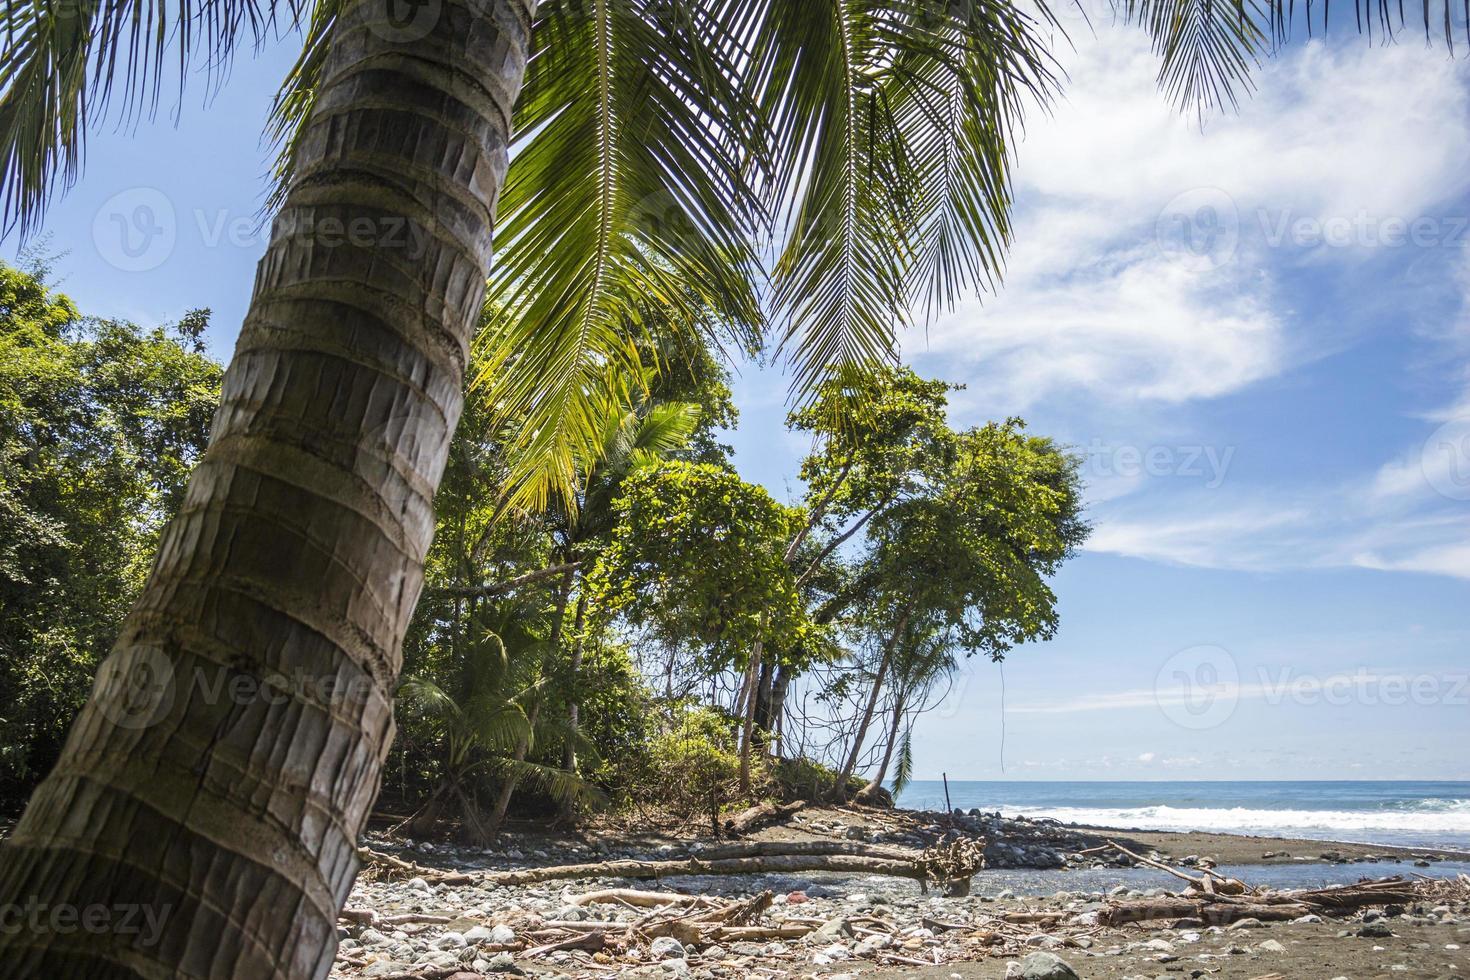 Strand und Dschungel in Costa Rica foto